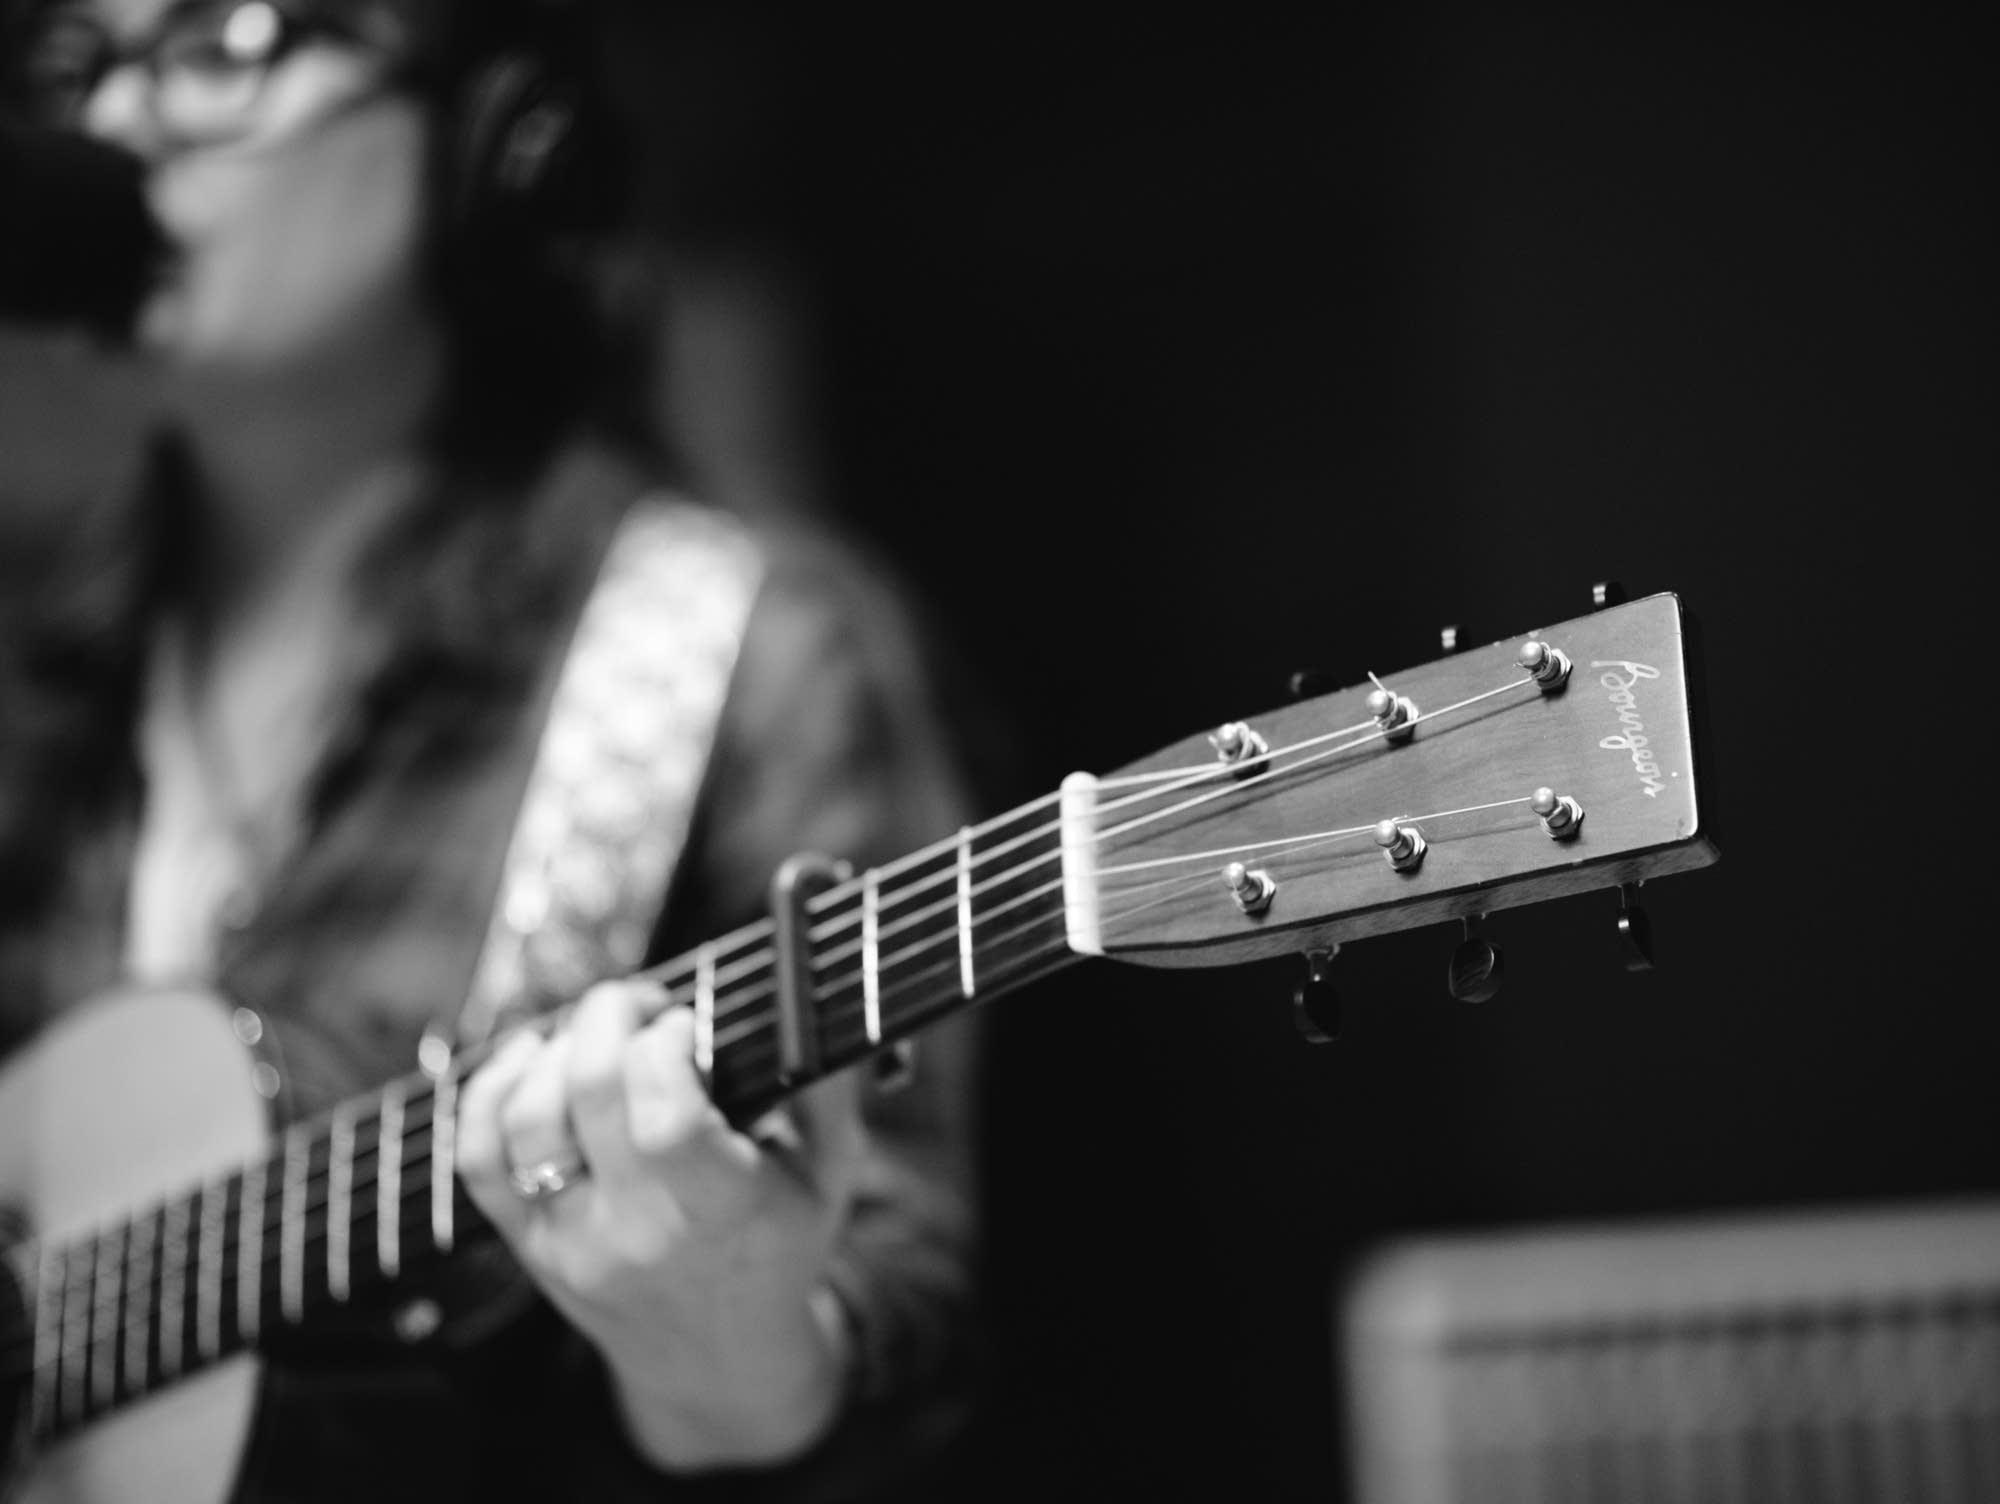 Sara Watkins' Dana Bourgeois guitar headstock